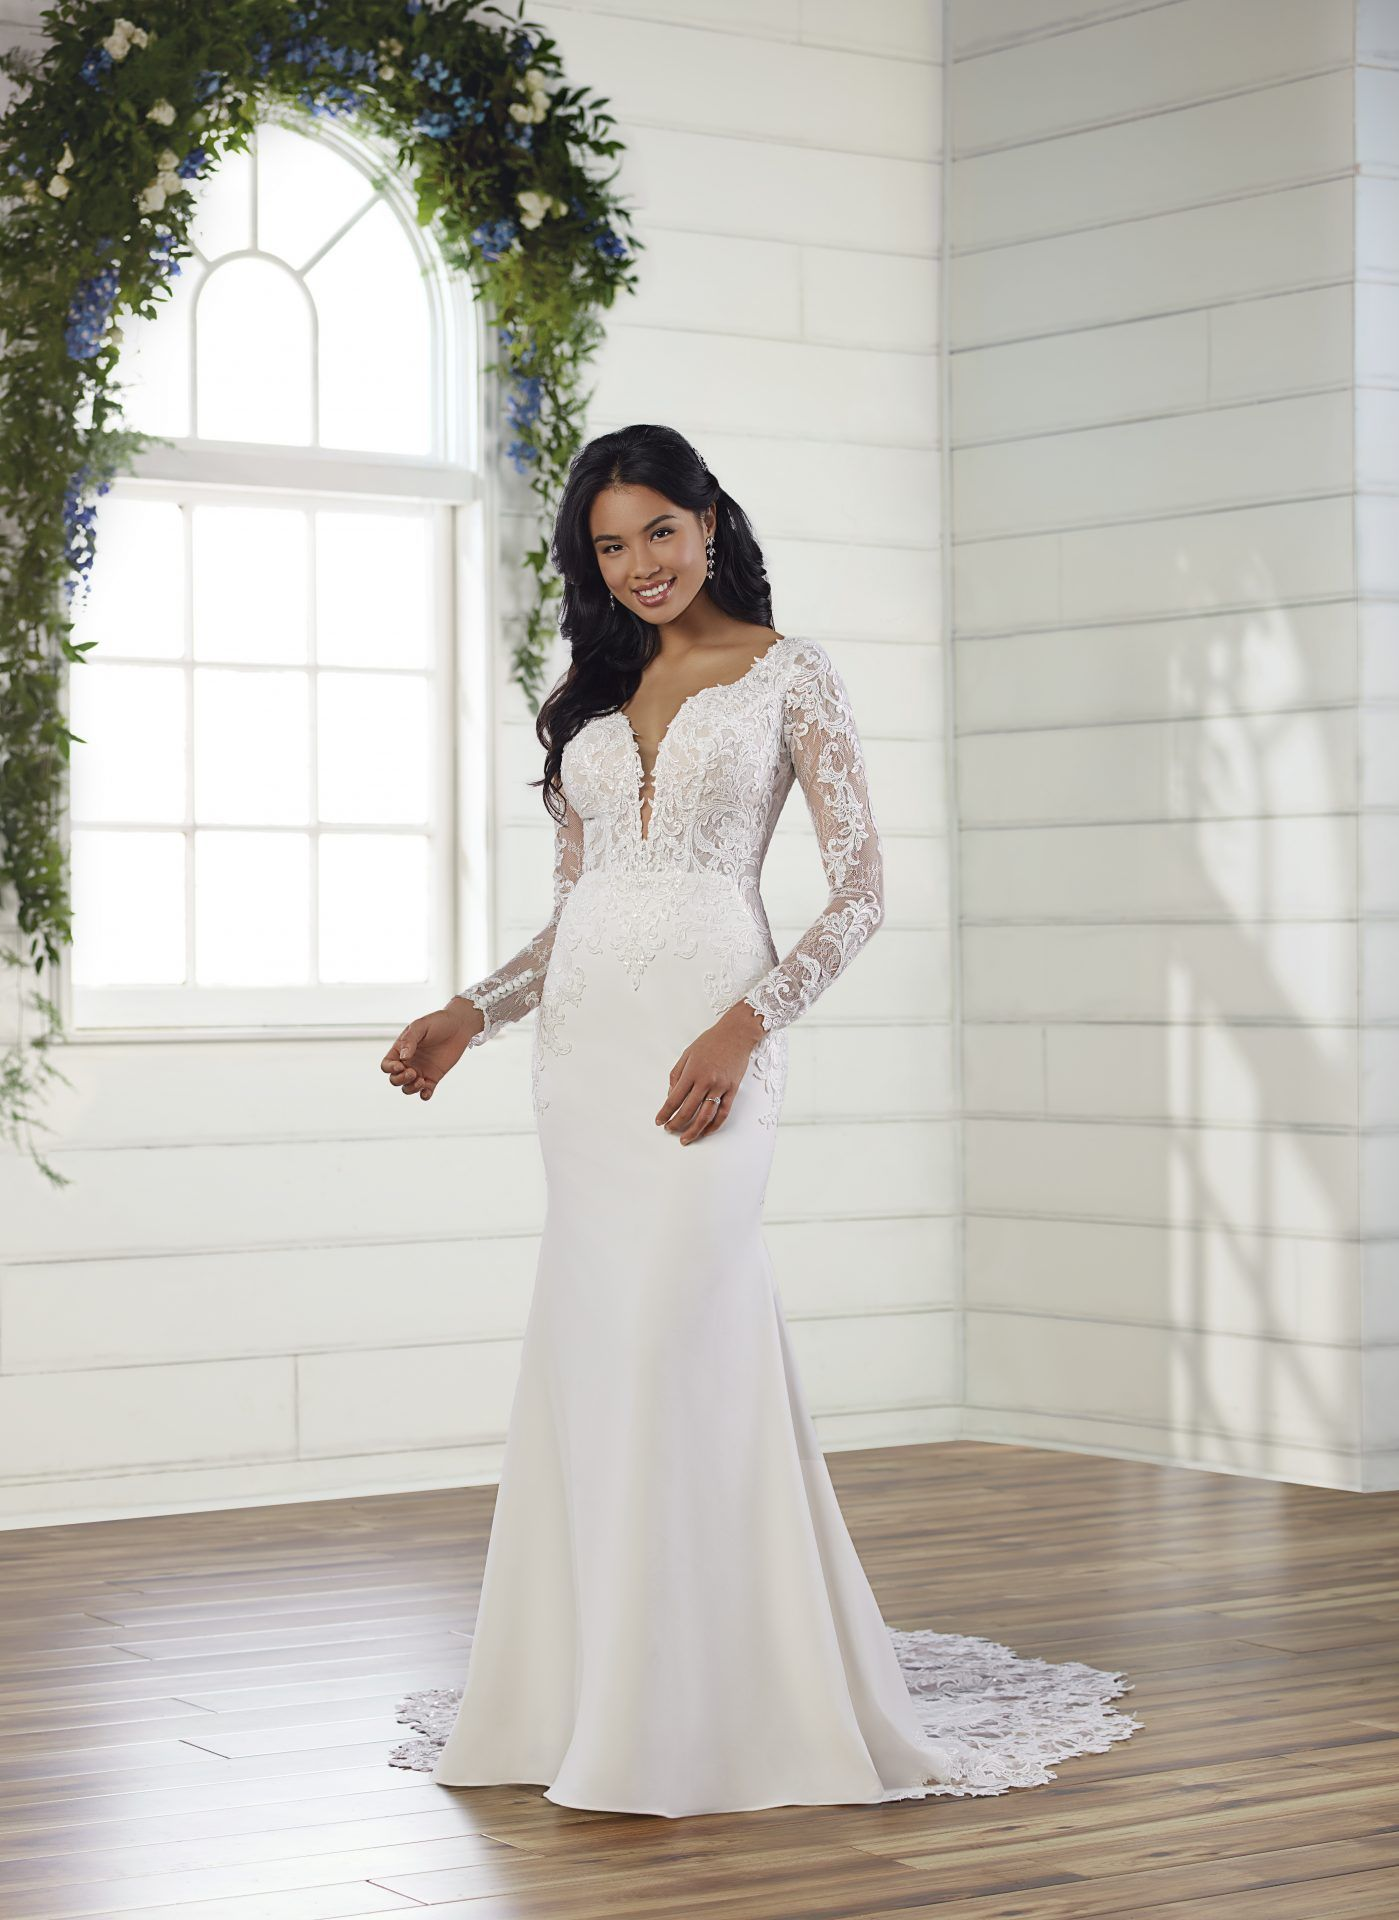 Essense of Australia in 2020 Crepe wedding dress